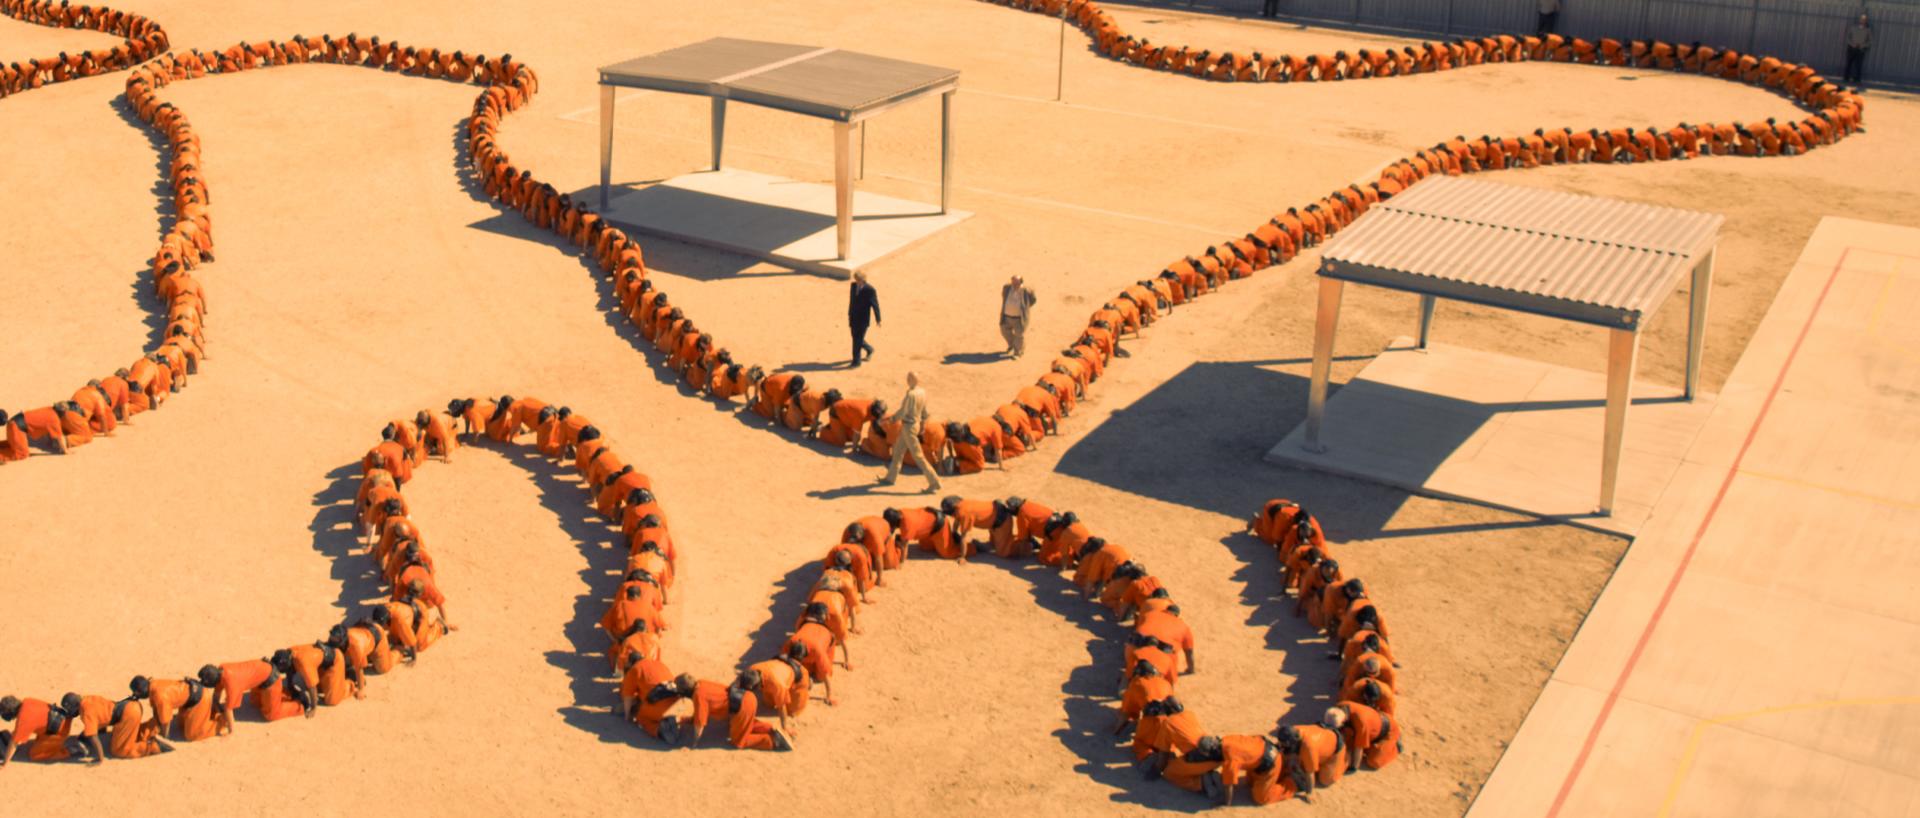 Human Centipede 3, image via IFC and Six Ent.